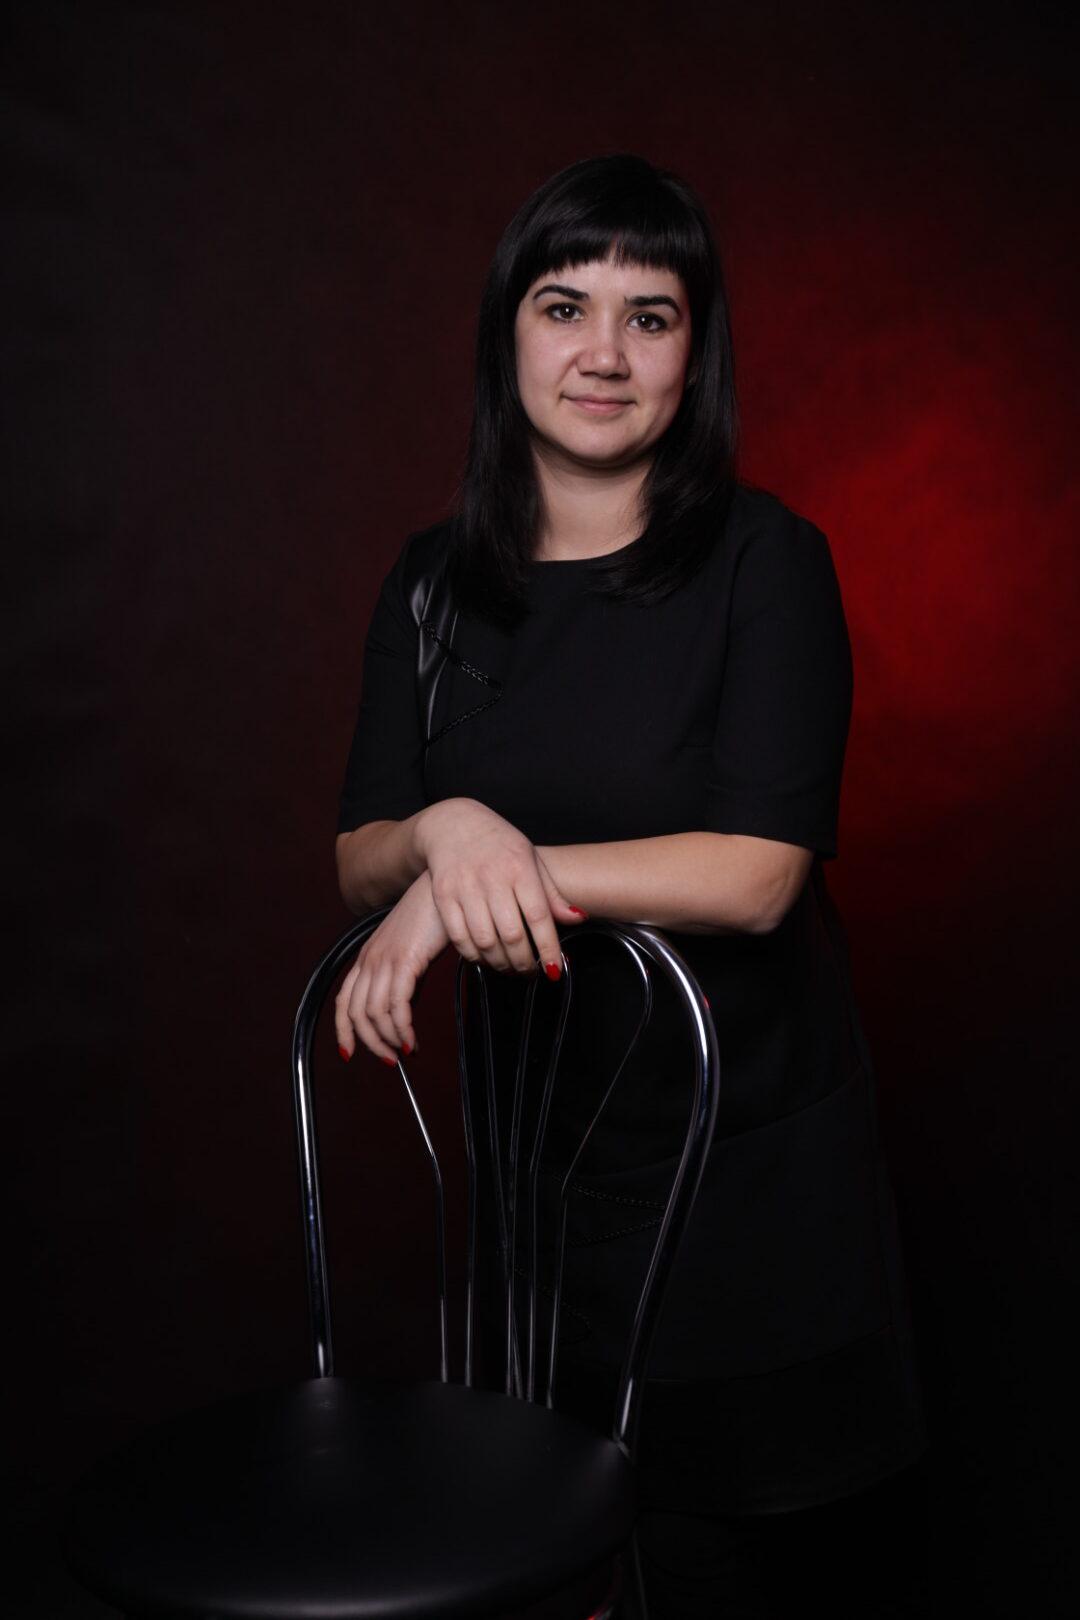 Макарова Юлия Андреевна